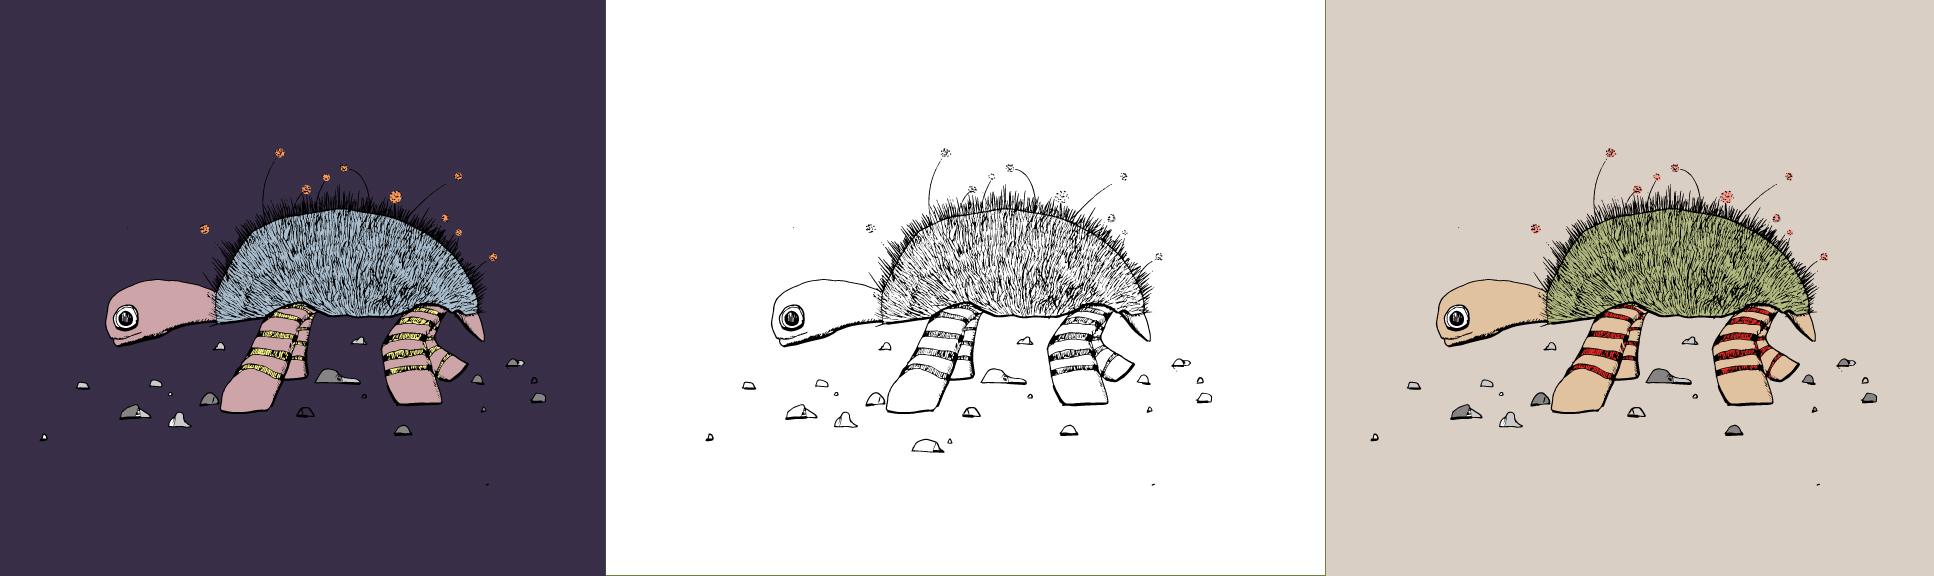 Customize Your Lazy Turtle Illustration - Art Print Animals